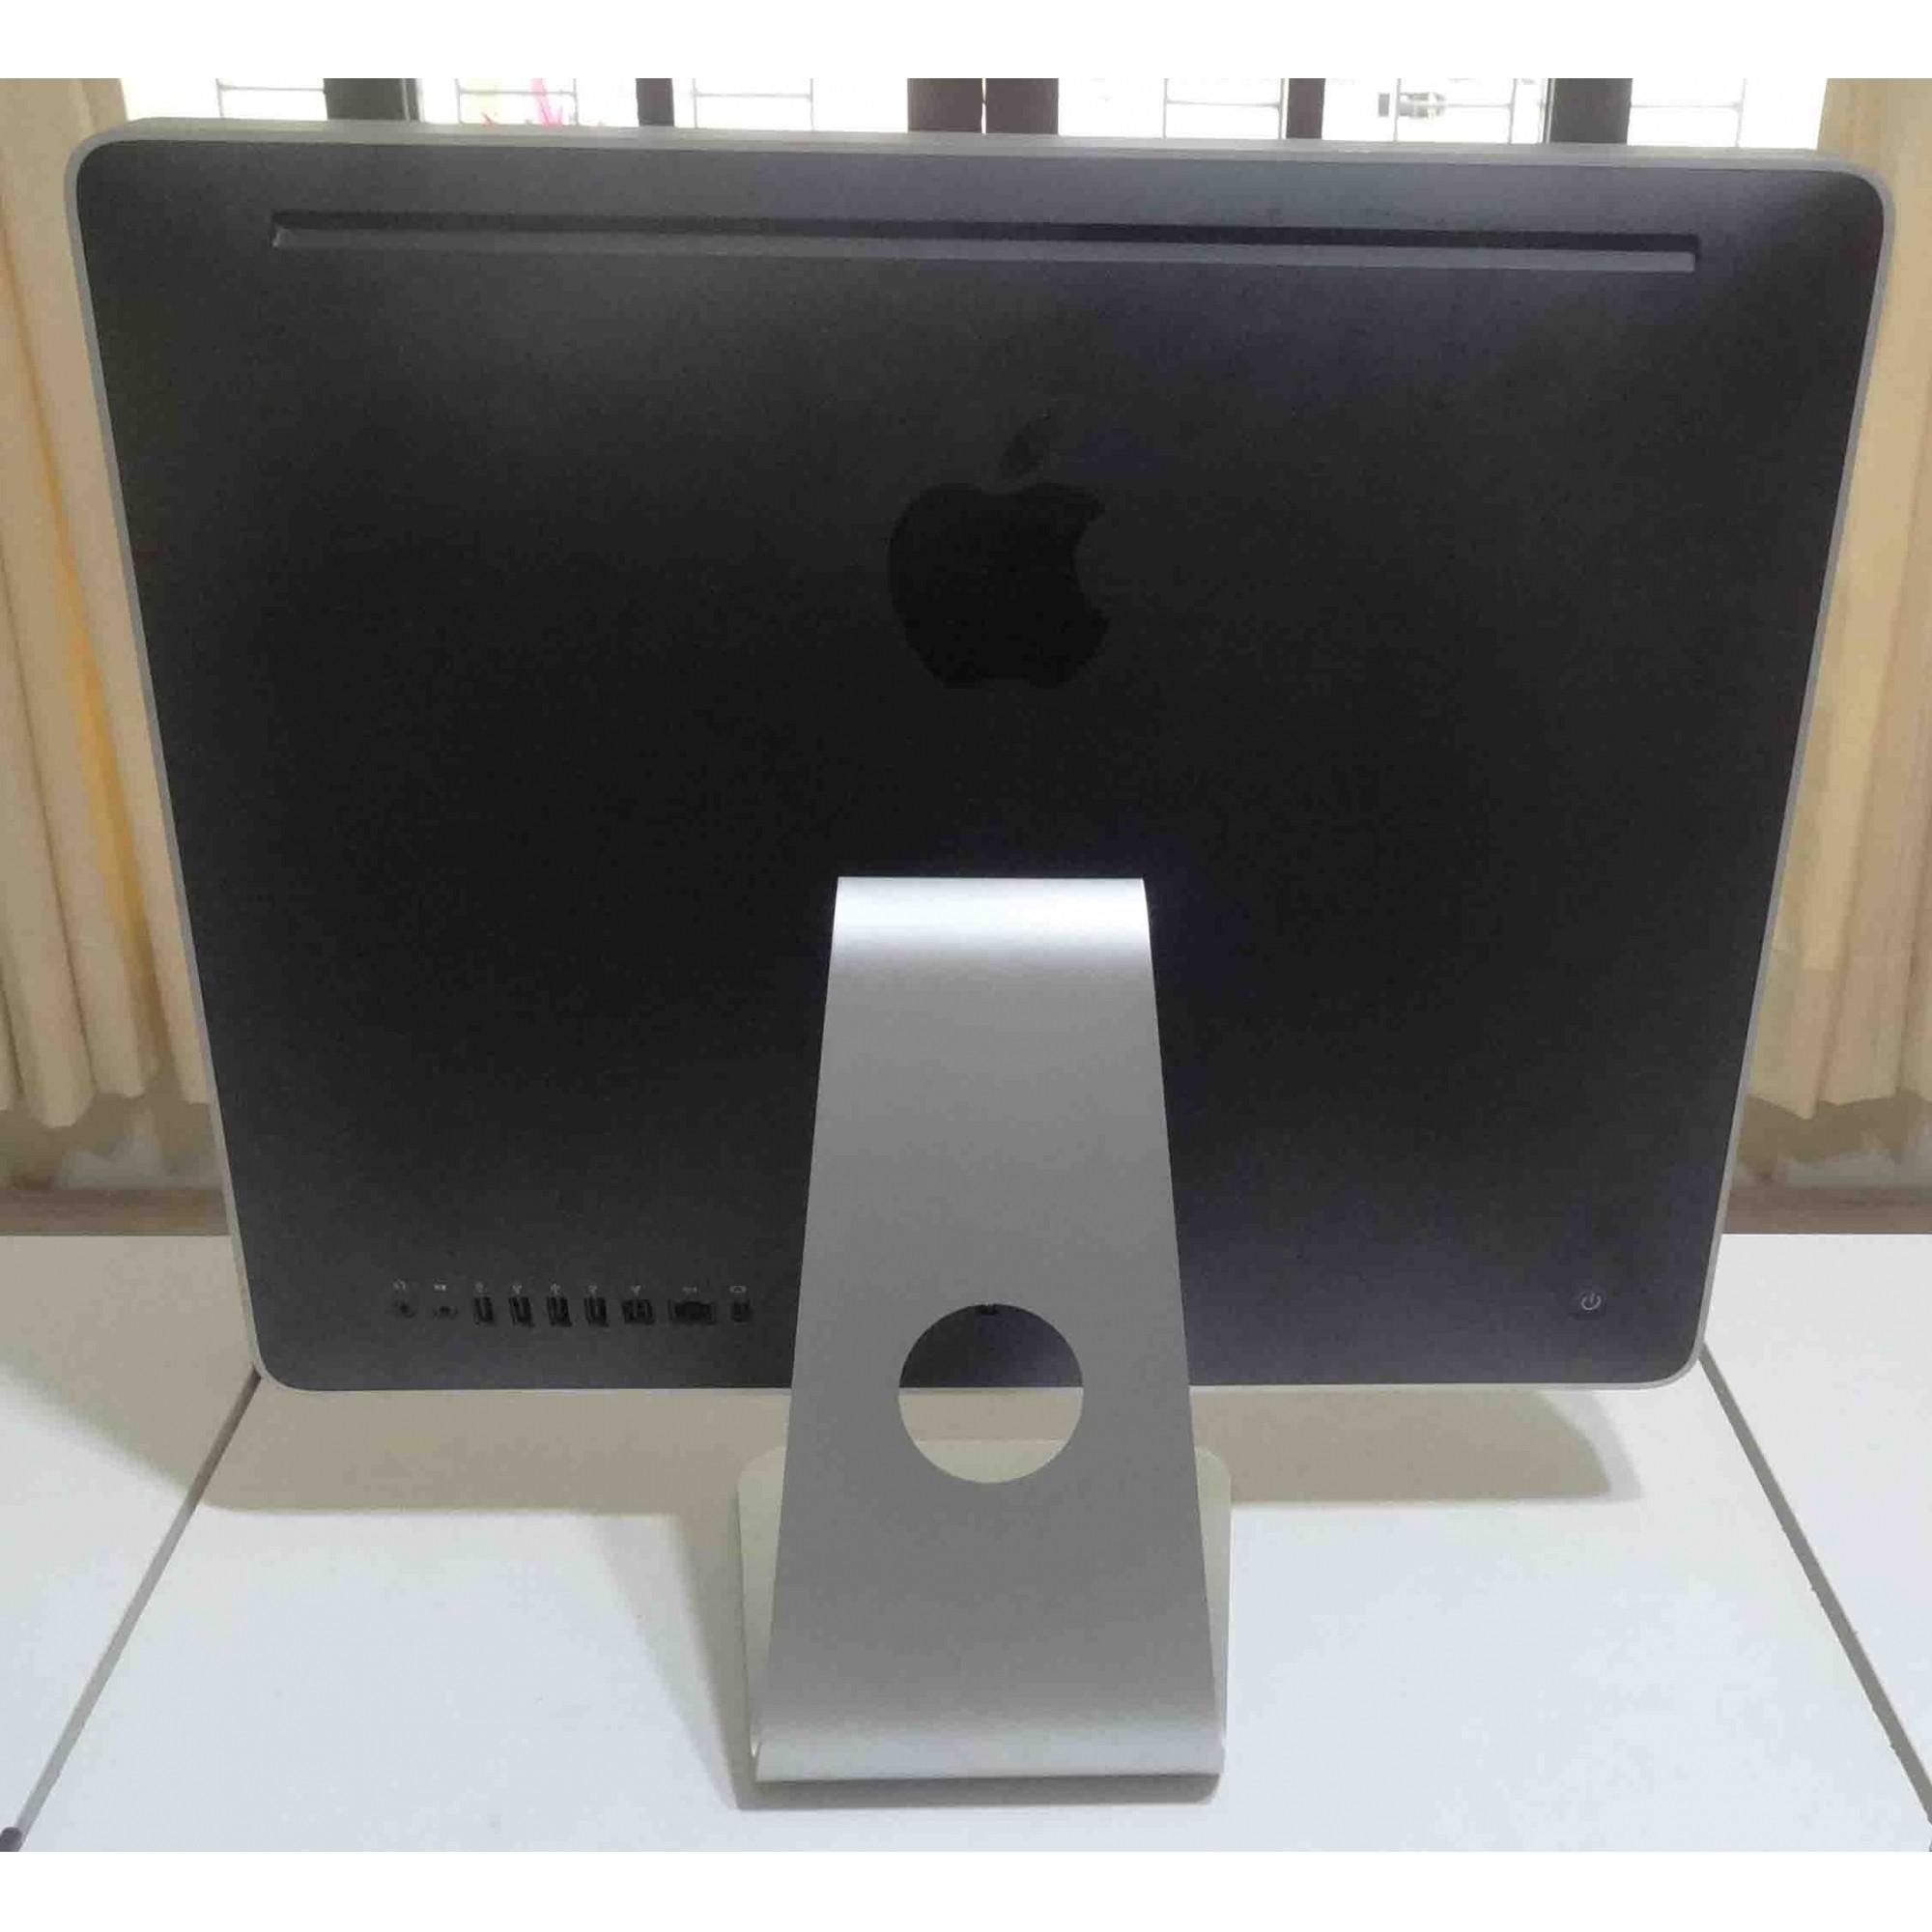 iMac MC015LL/A Intel Core 2 Duo 2GHz 4GB HD-160GB (NÃO ENVIAMOS)